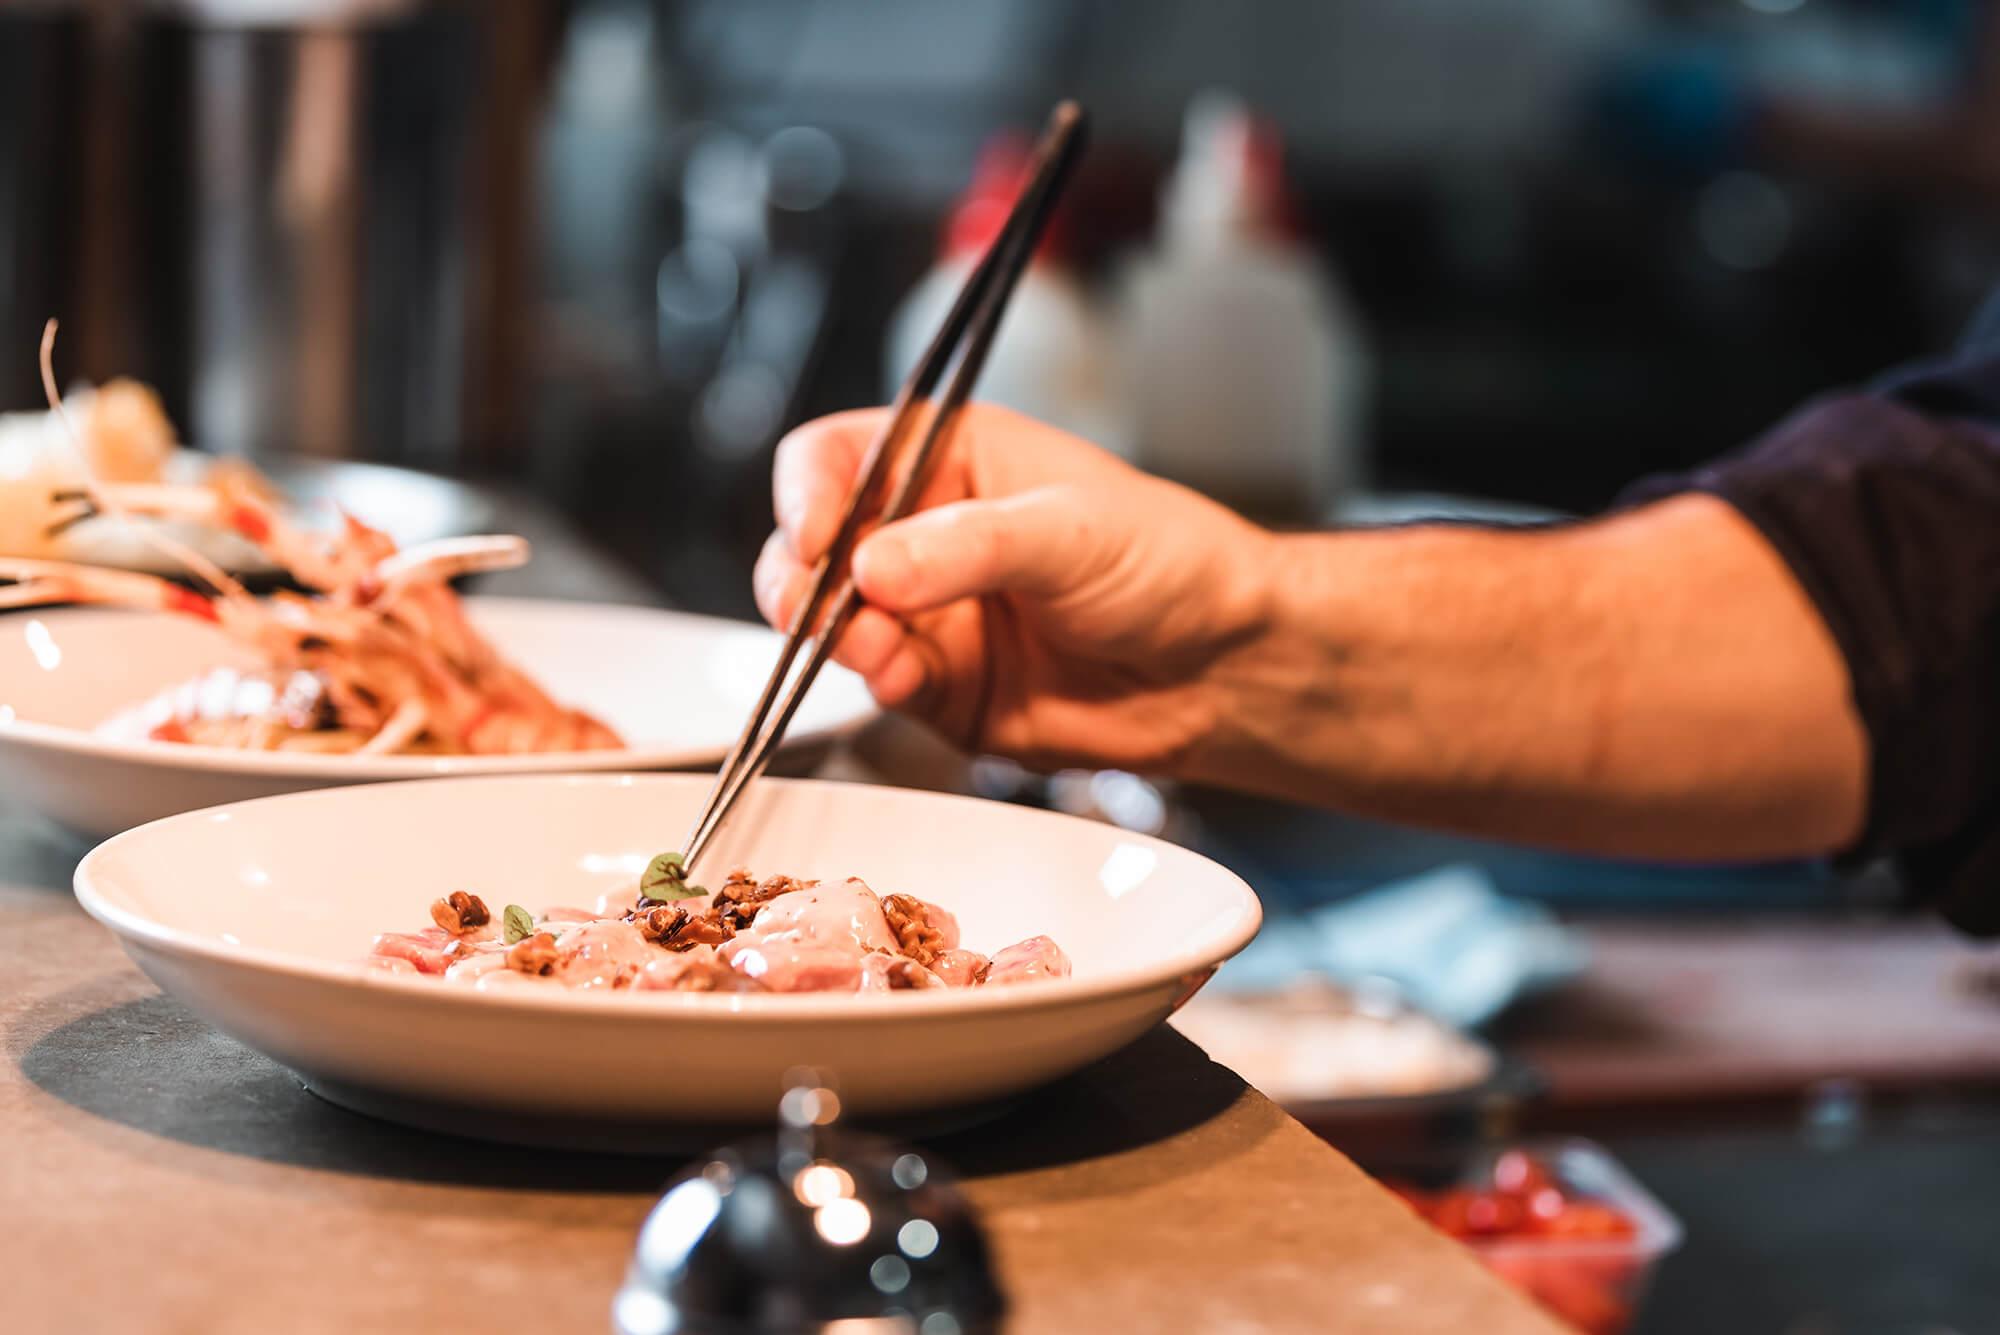 Secolo Dining Authentic Italian Food Sydney CBD